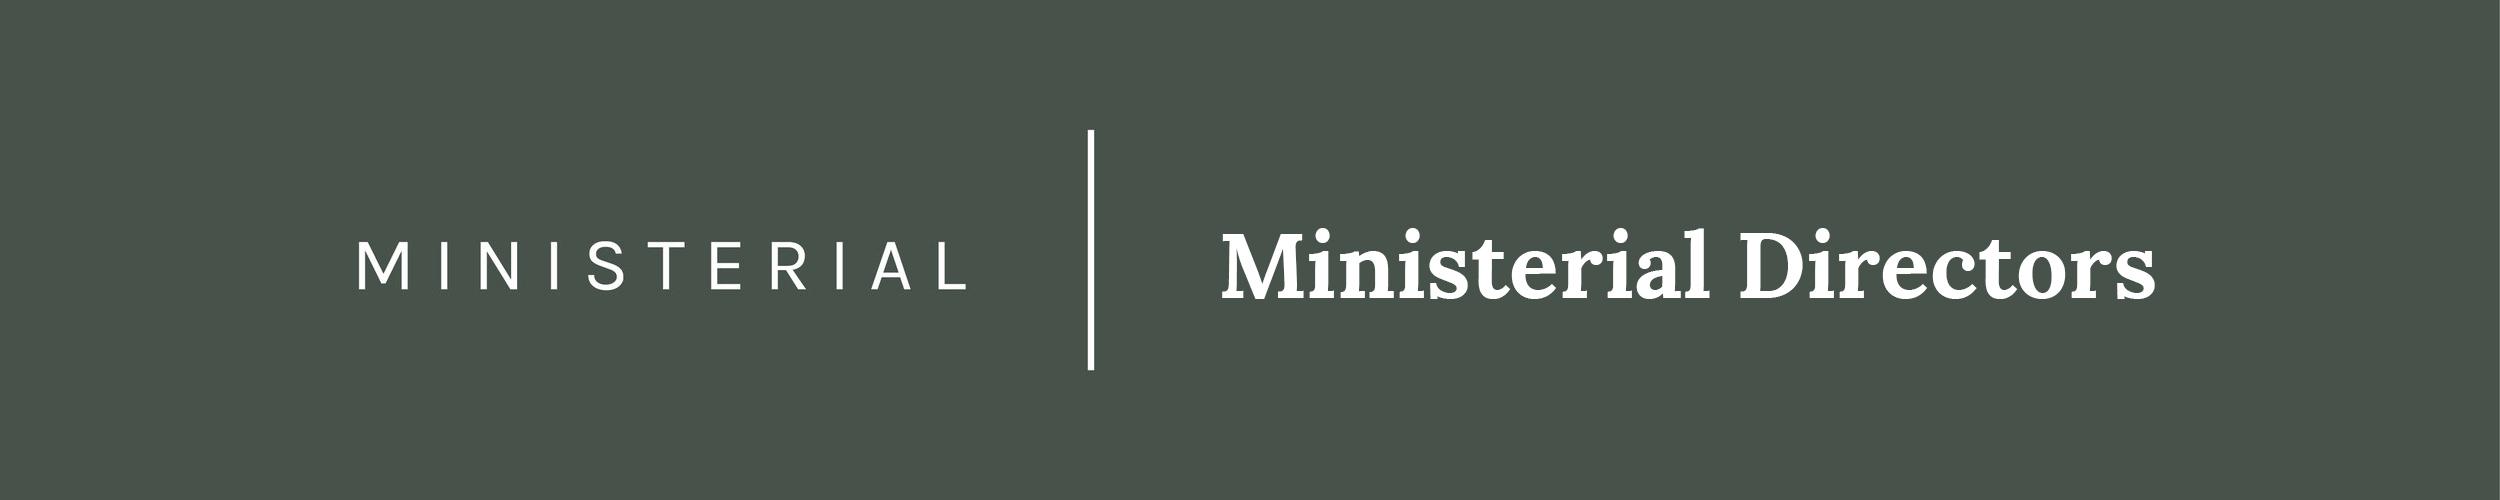 Banner-Ministerial-Ministerial Directors.jpg